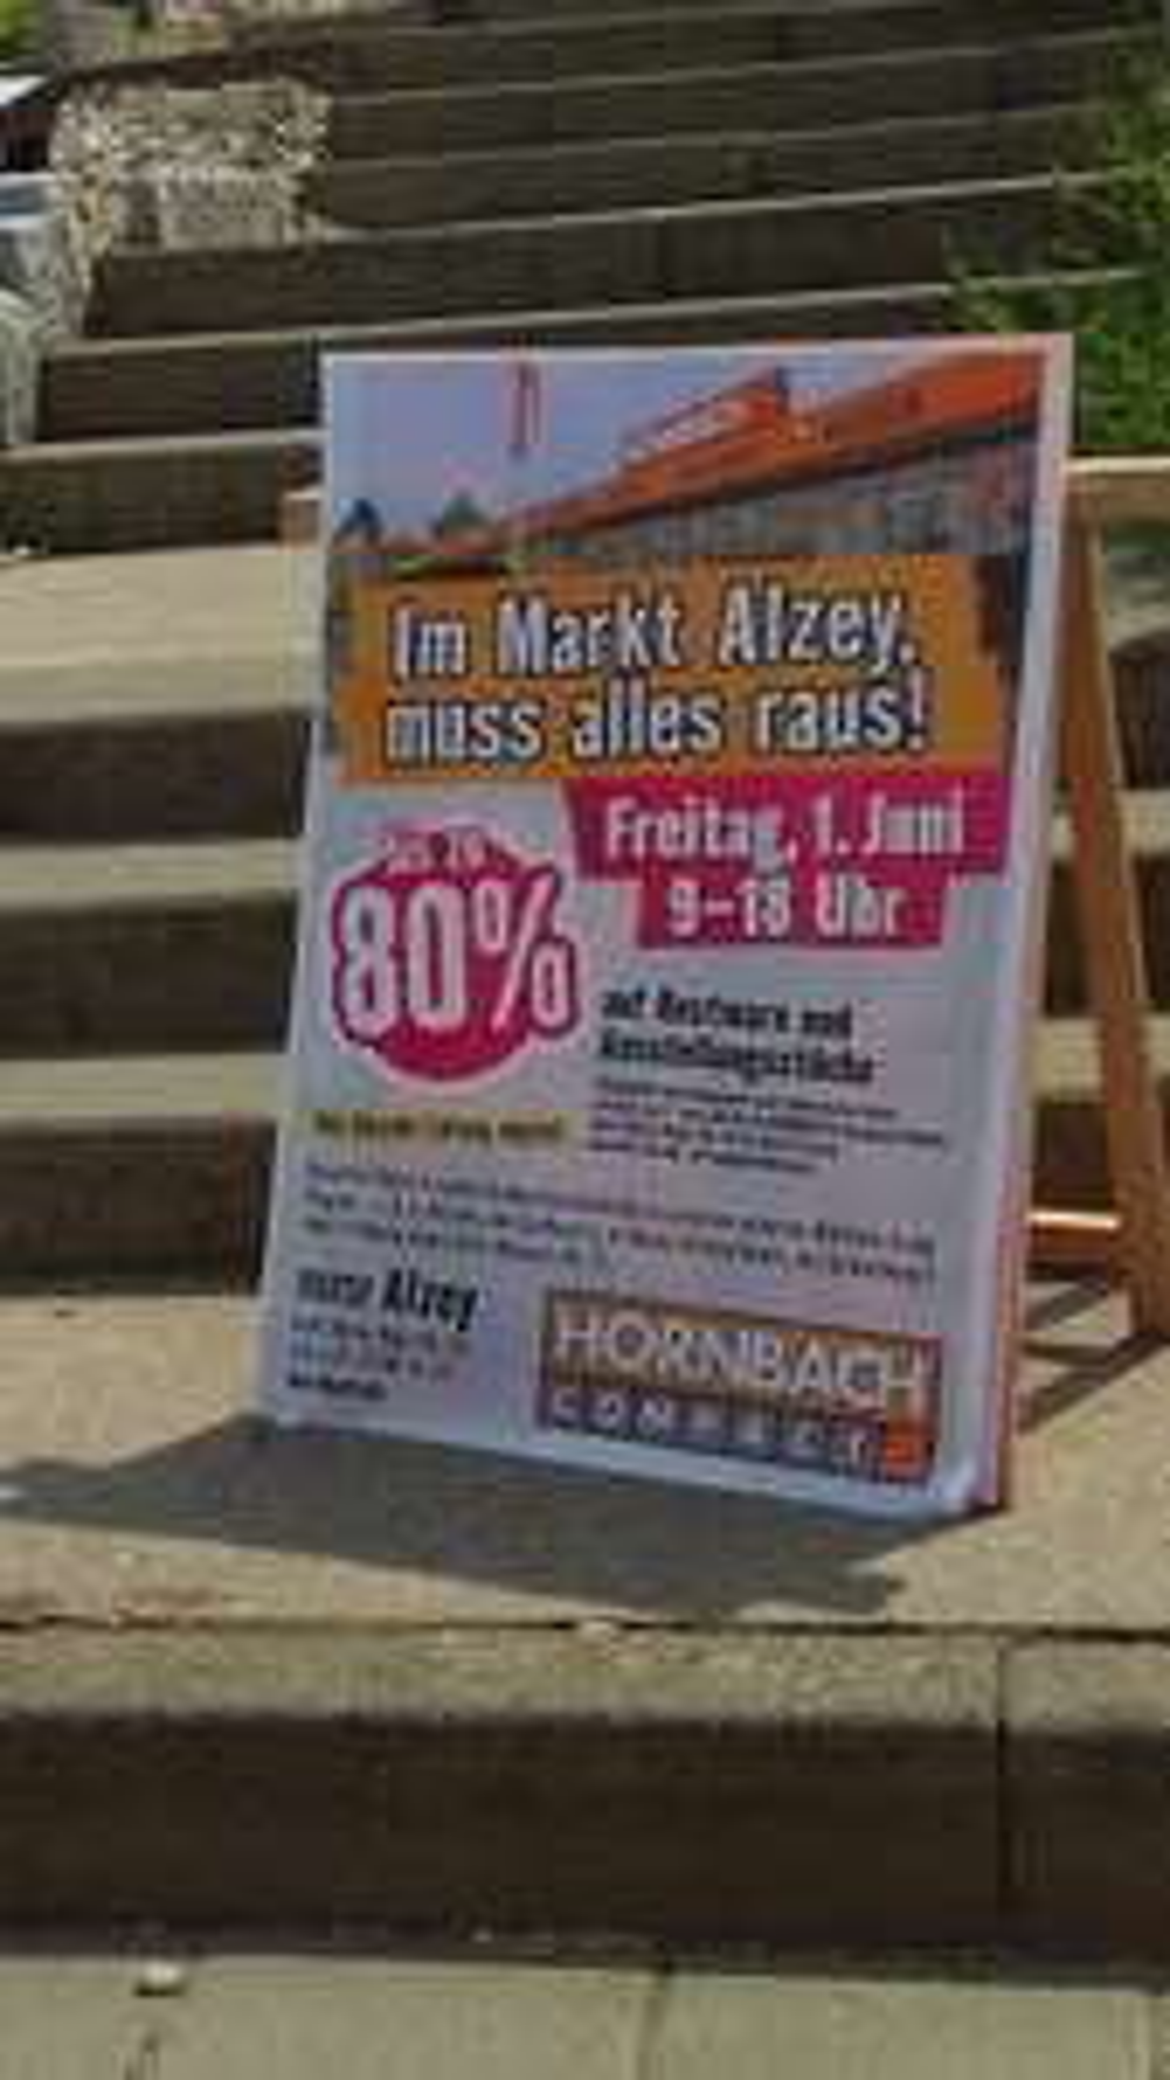 Lokal Hornbach Alzey Abverkauf bis zu 80%